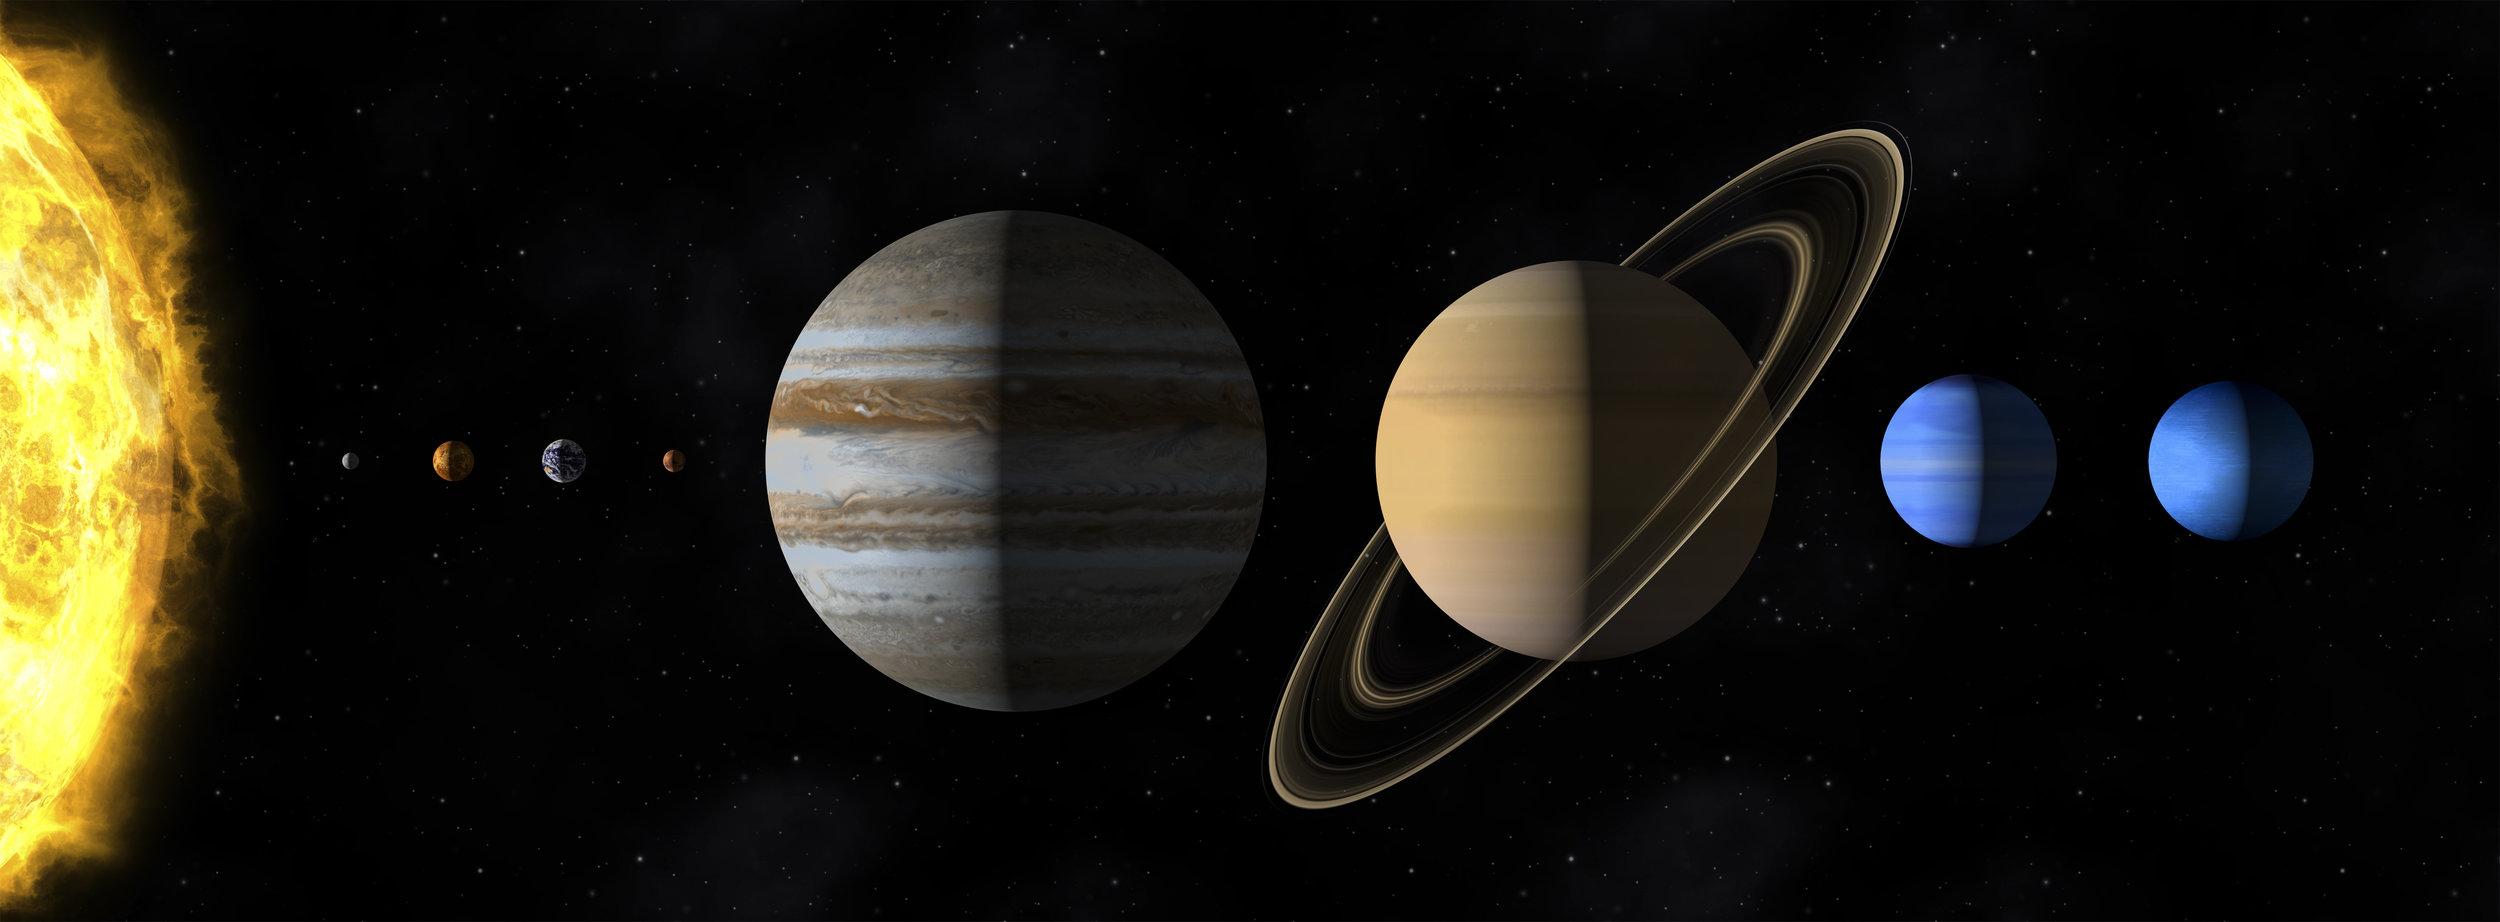 our-sun-system-PP7H276.jpg